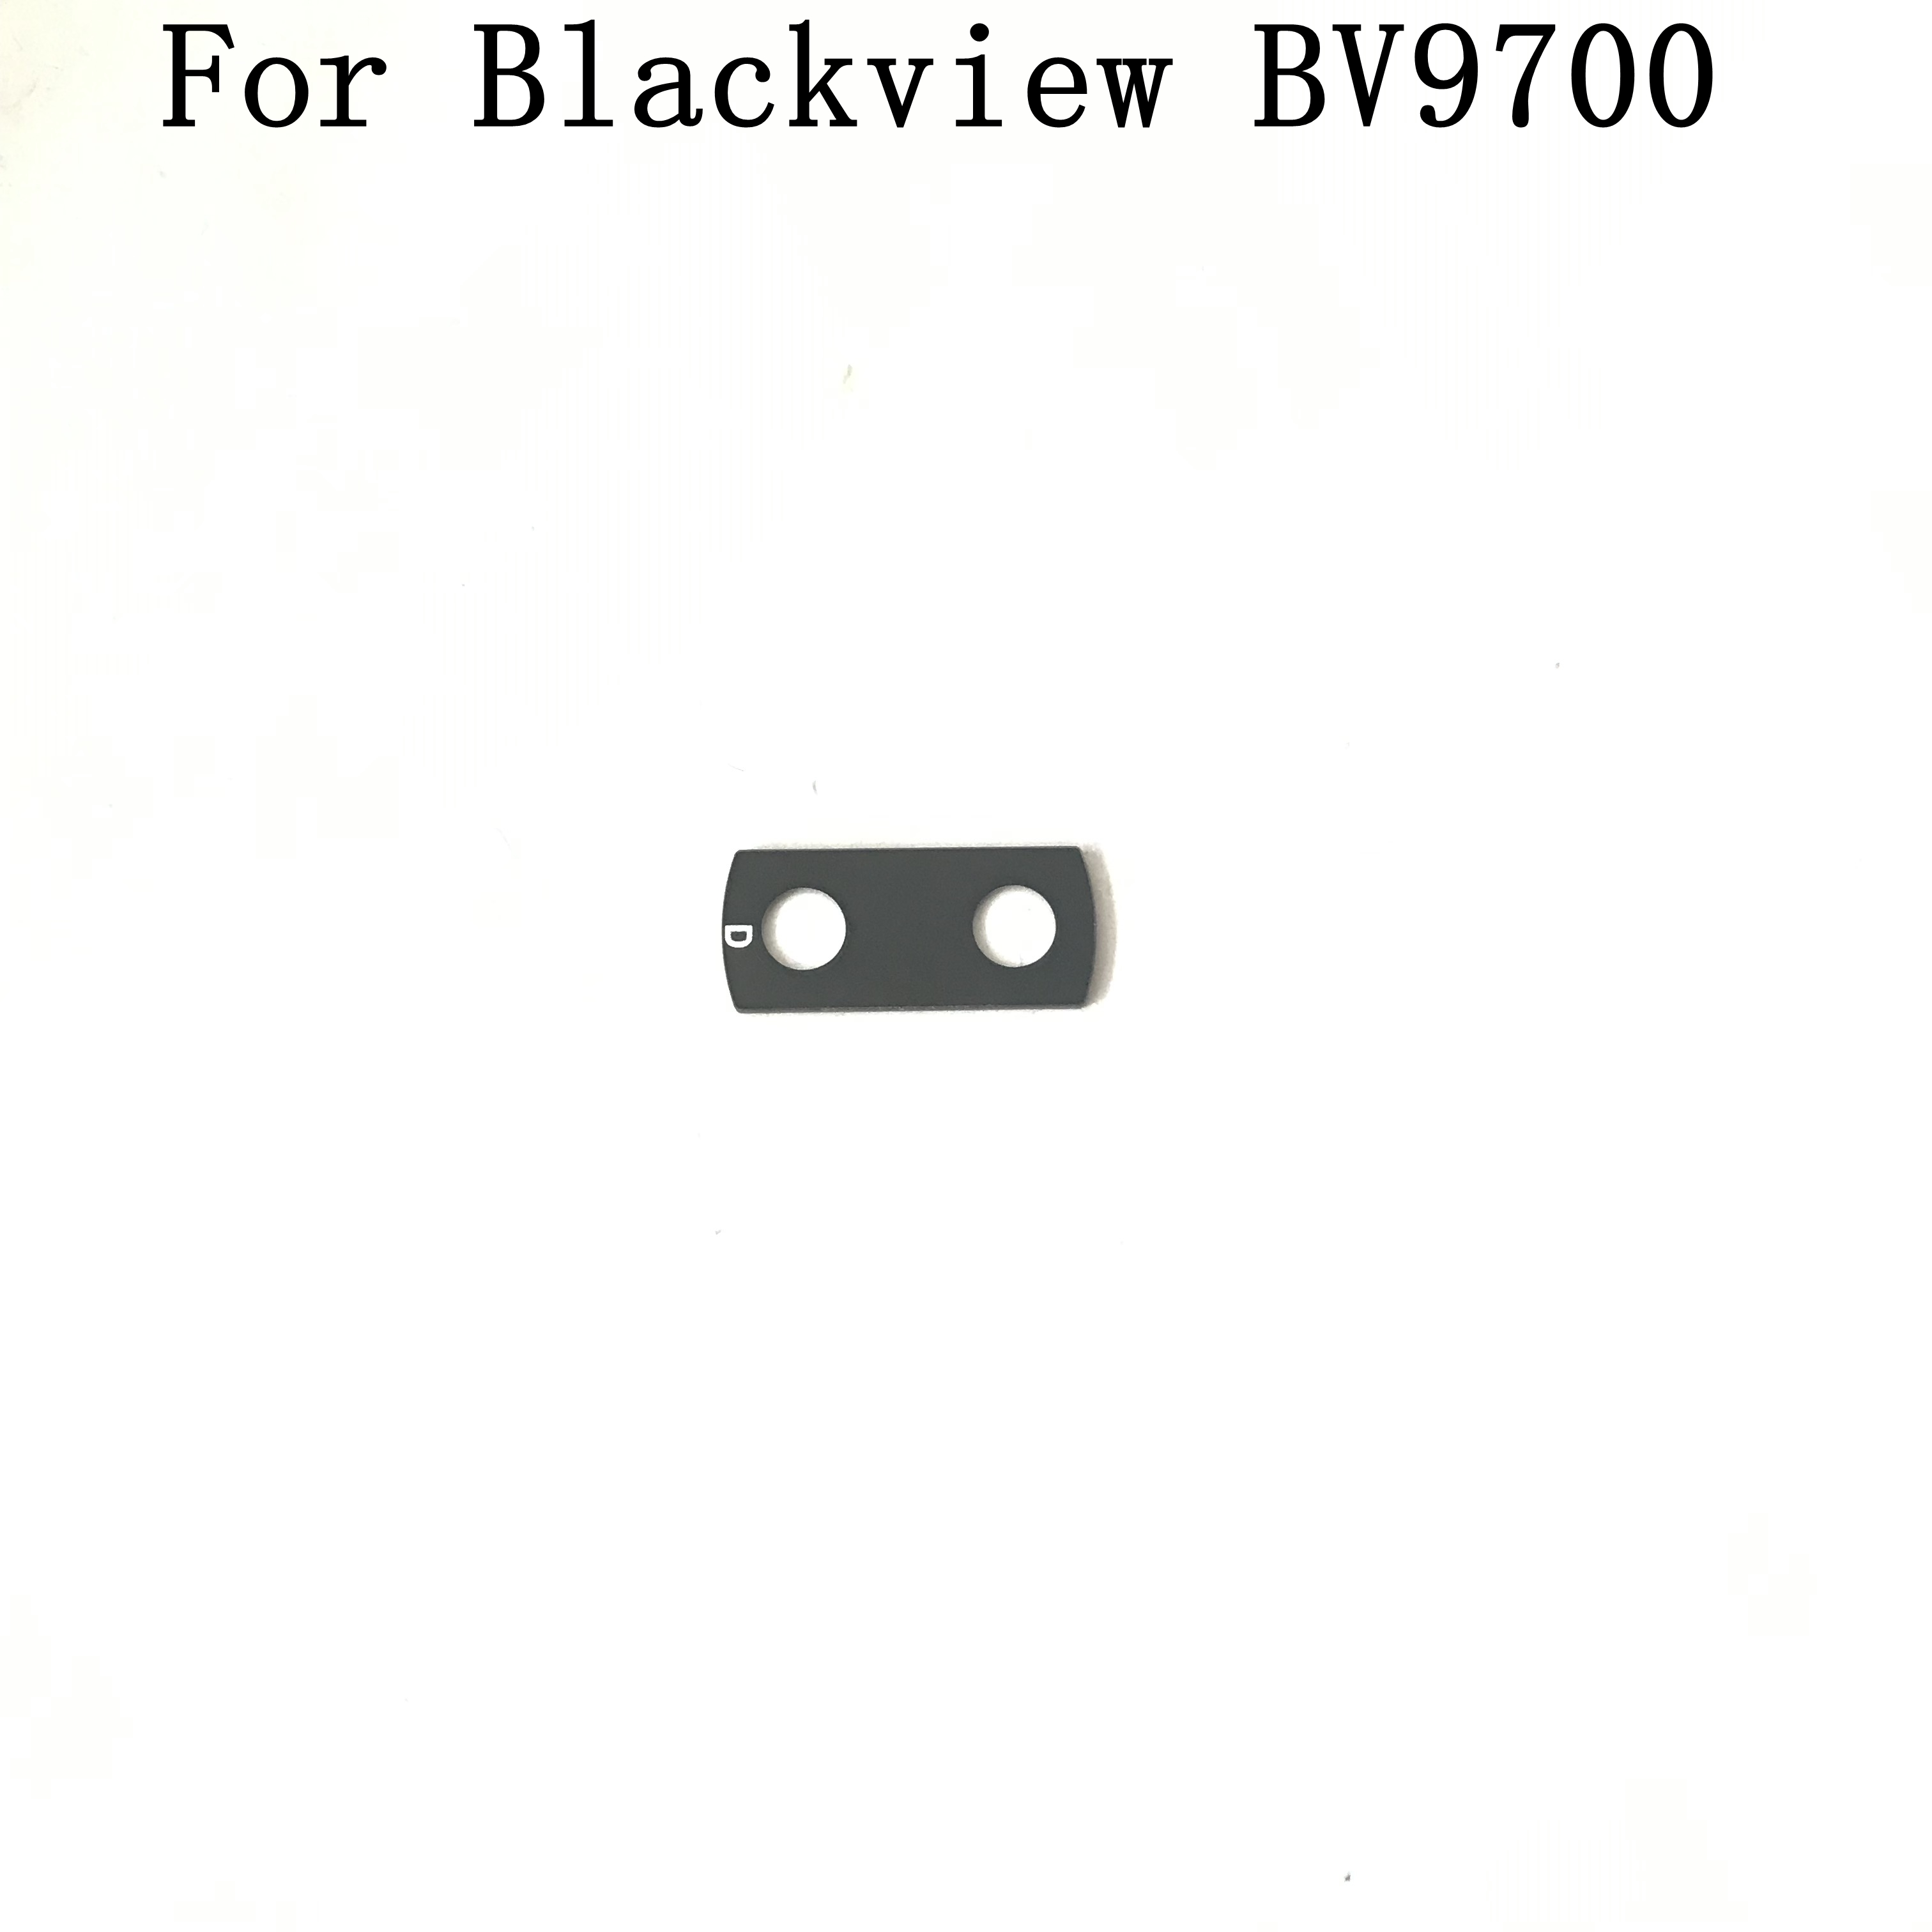 Blackview BV9700 New Camera Glass Lens Rear Cover For Blackview BV9700 Pro MTK6771T 5.84inch 2280*1080 Smartphone